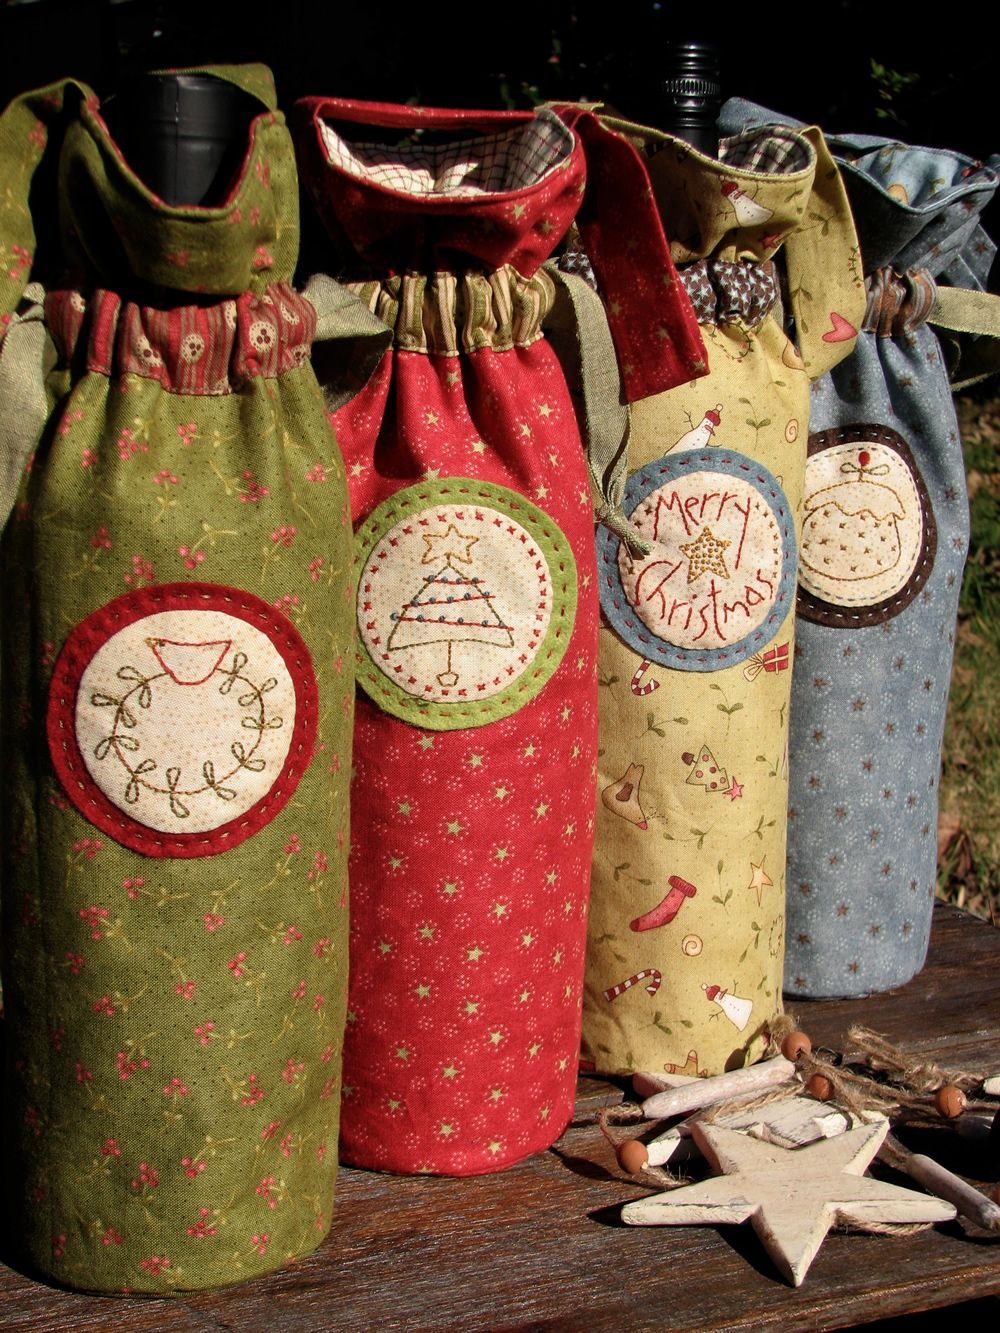 6a00e008c5cdce883401676894b5a4970b Pi 1 000 1 333 Pixels Wine Bottle Gift Bag Bottle Crafts Crafts